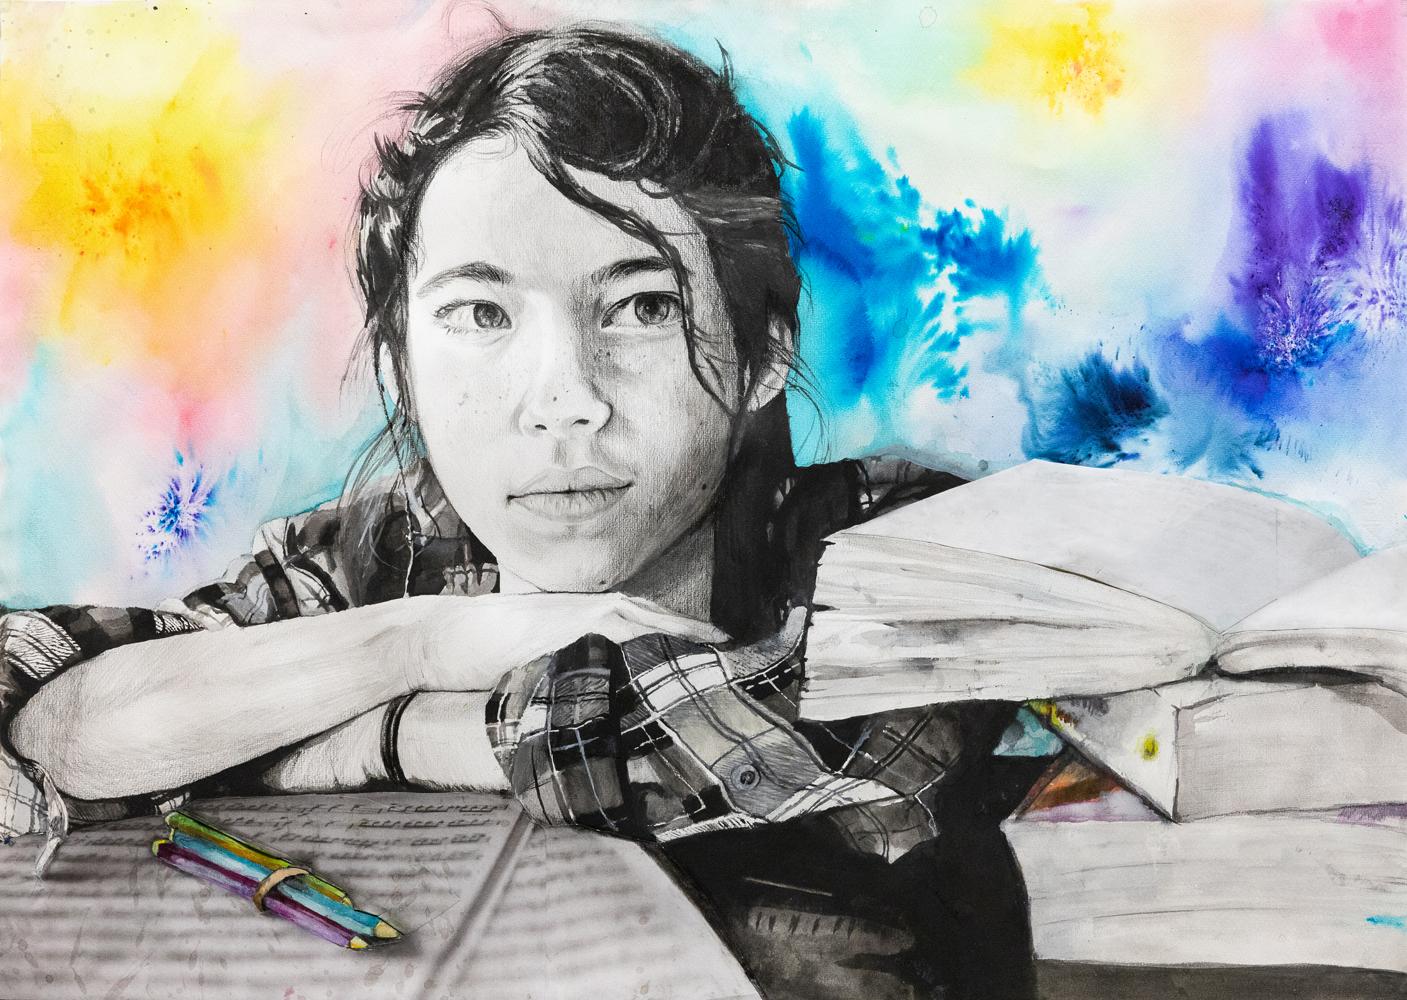 57. Lorena Dionigi, 'Pensive', Watercolour, pencil drawing, collage, Year 10, St Joseph's Regional College, Port Macquarie